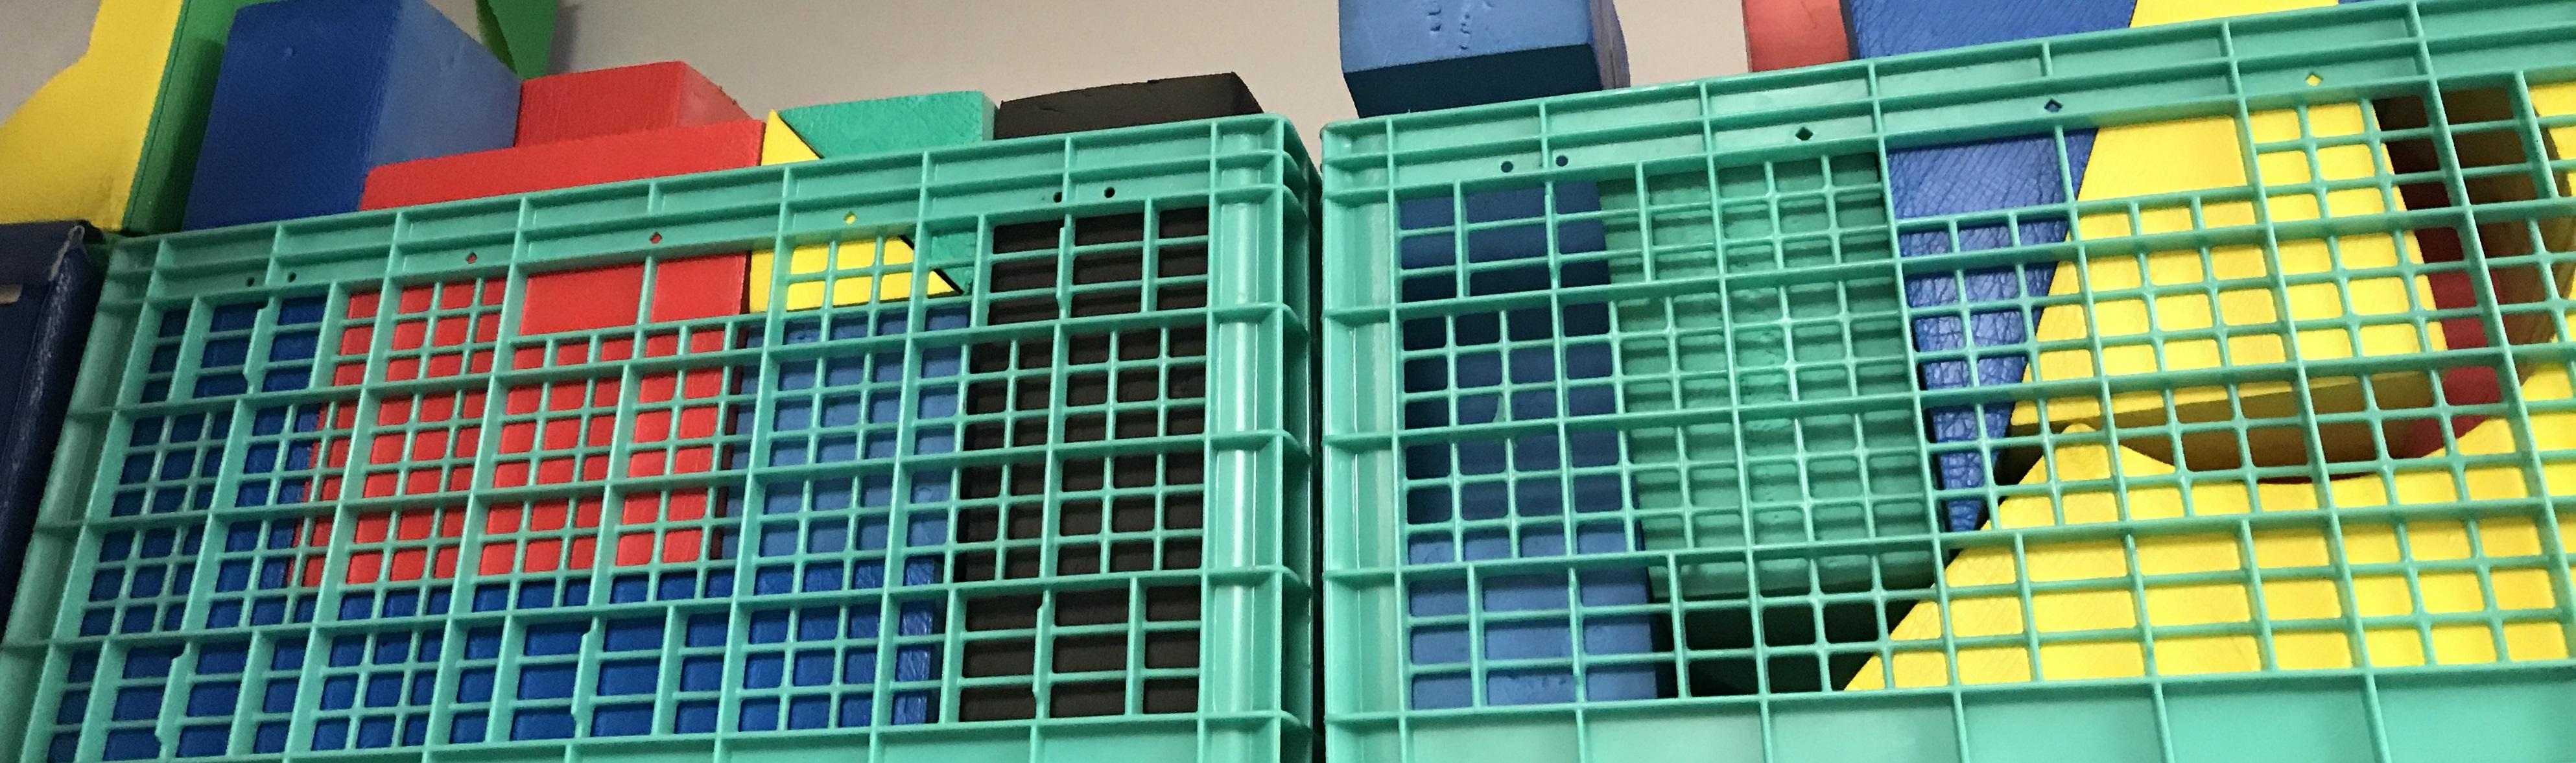 Big Soft Building Blocks